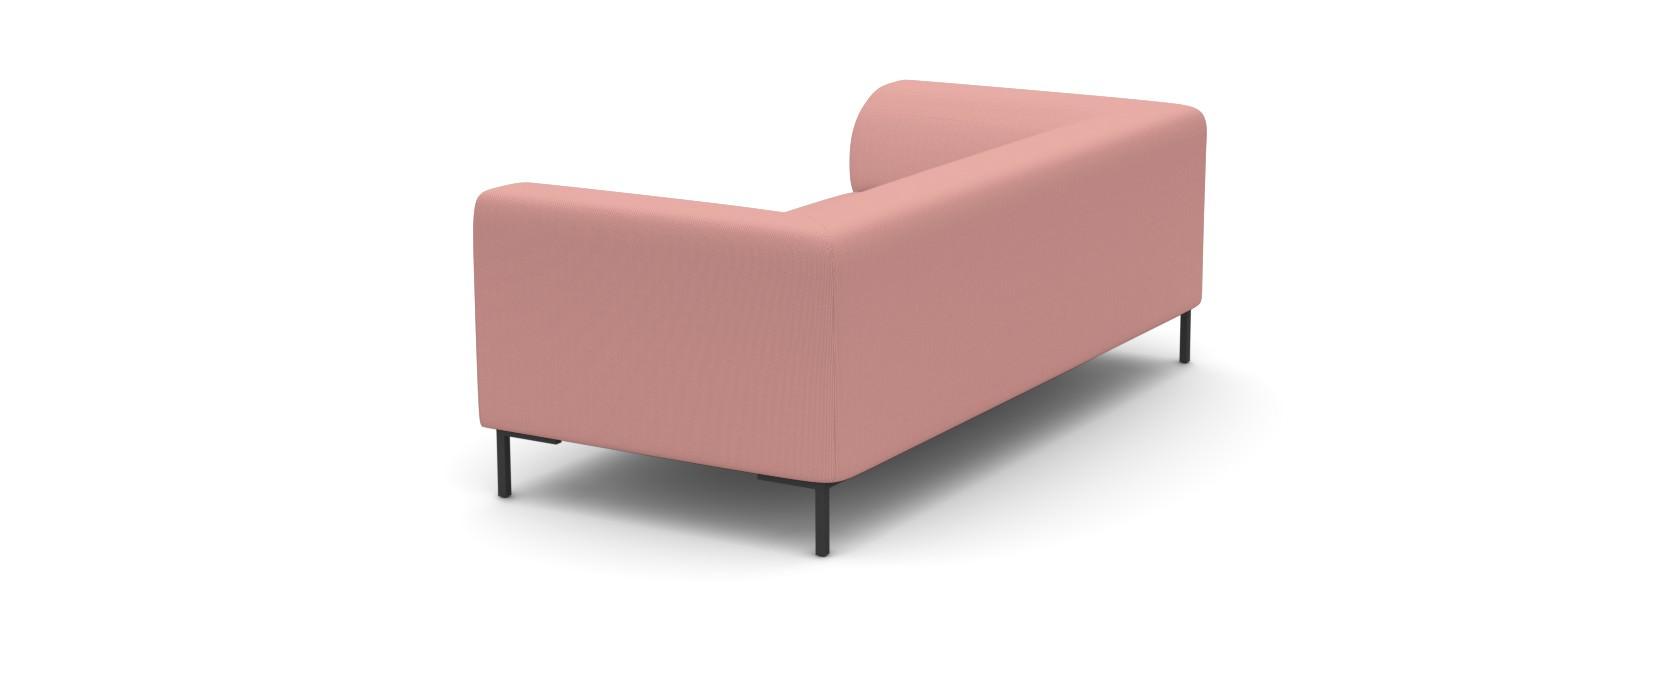 2-Sitzer Sofa Merano